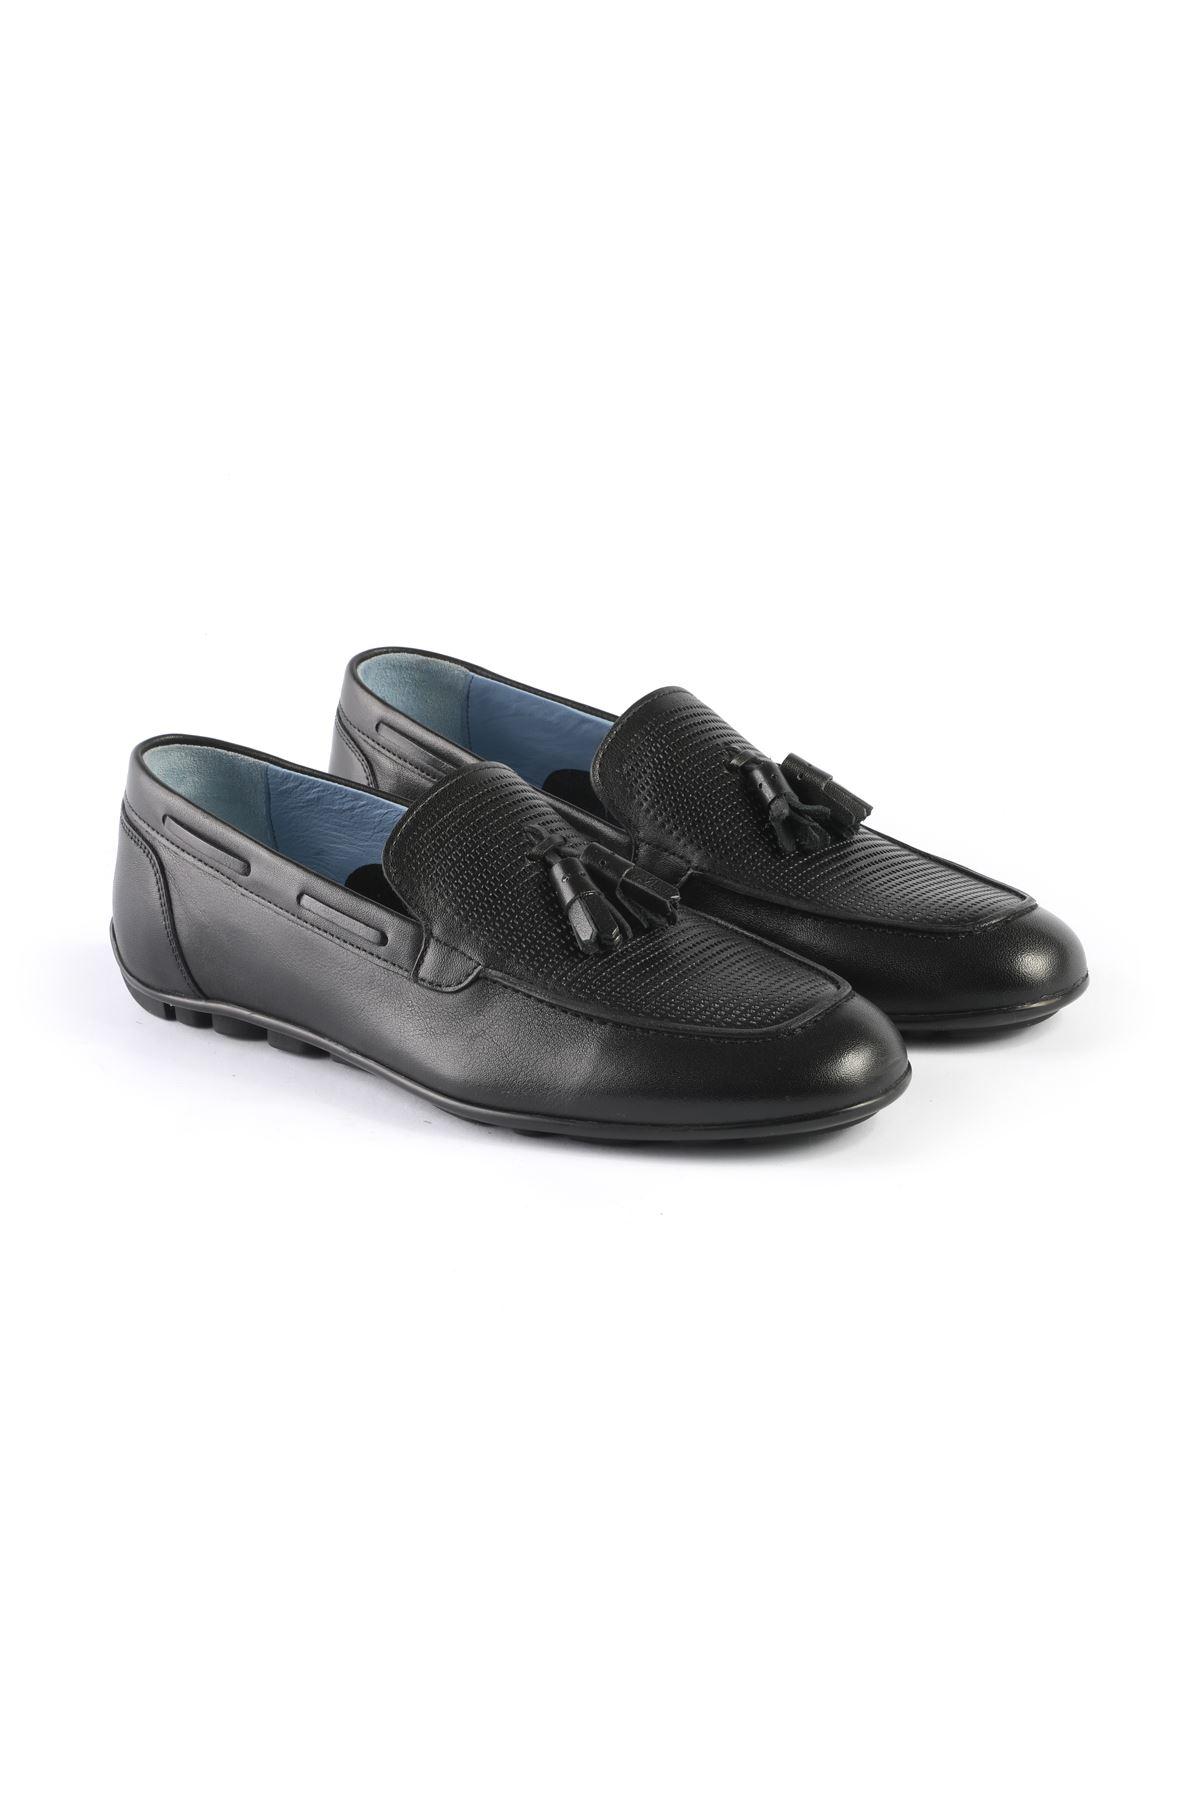 Libero L3408 Black Loafer Shoes